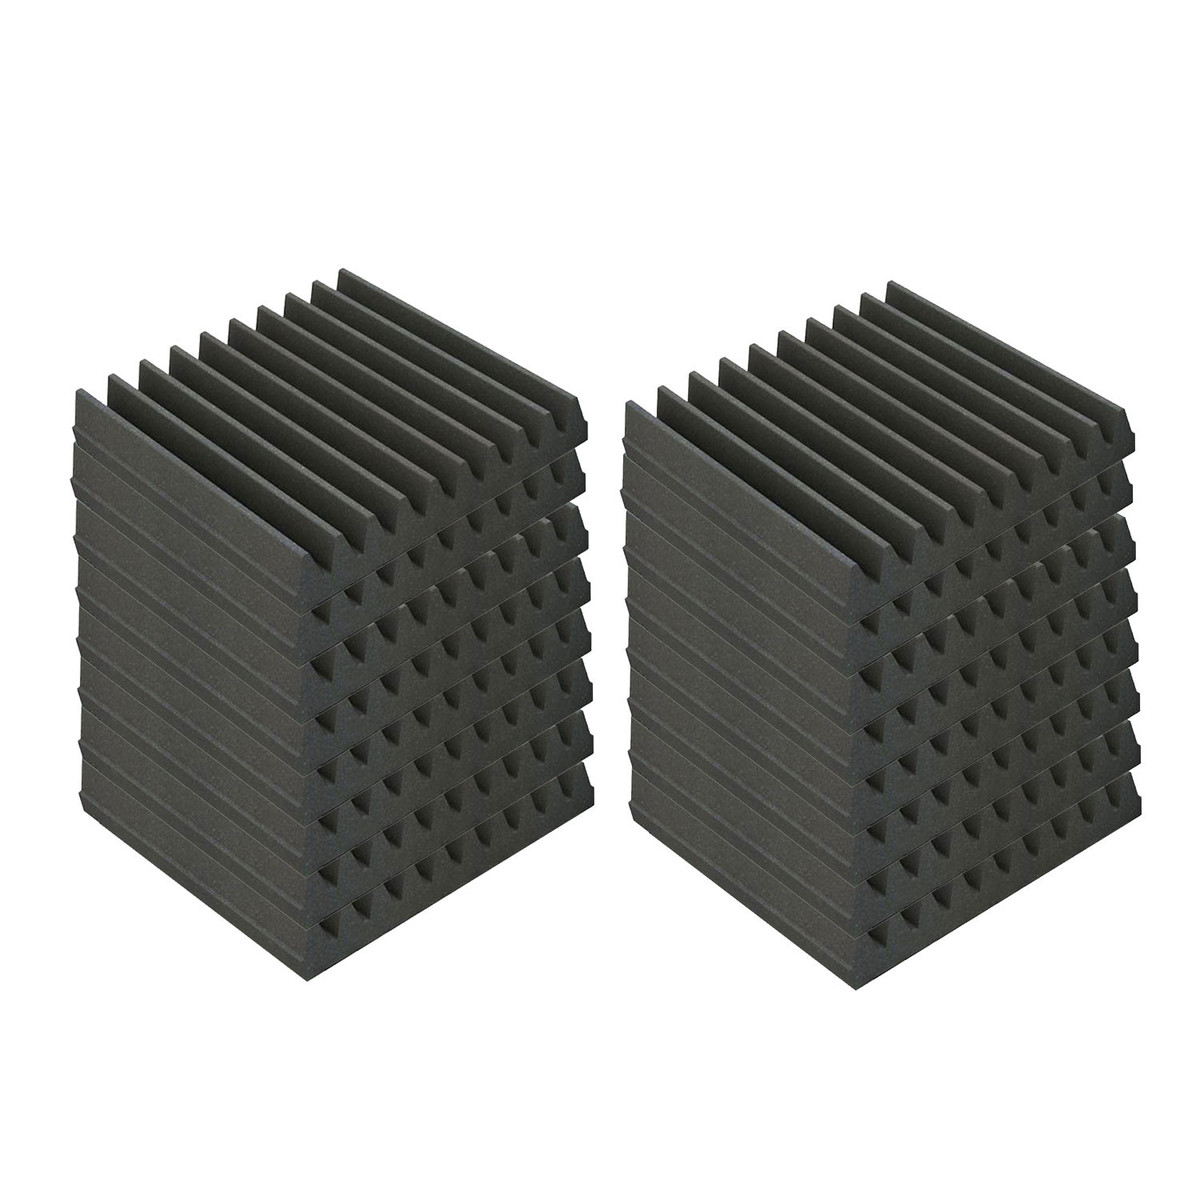 Image of EQ Acoustics Classic Wedge 30 30cm Foam Tiles Grey (16 Pack)